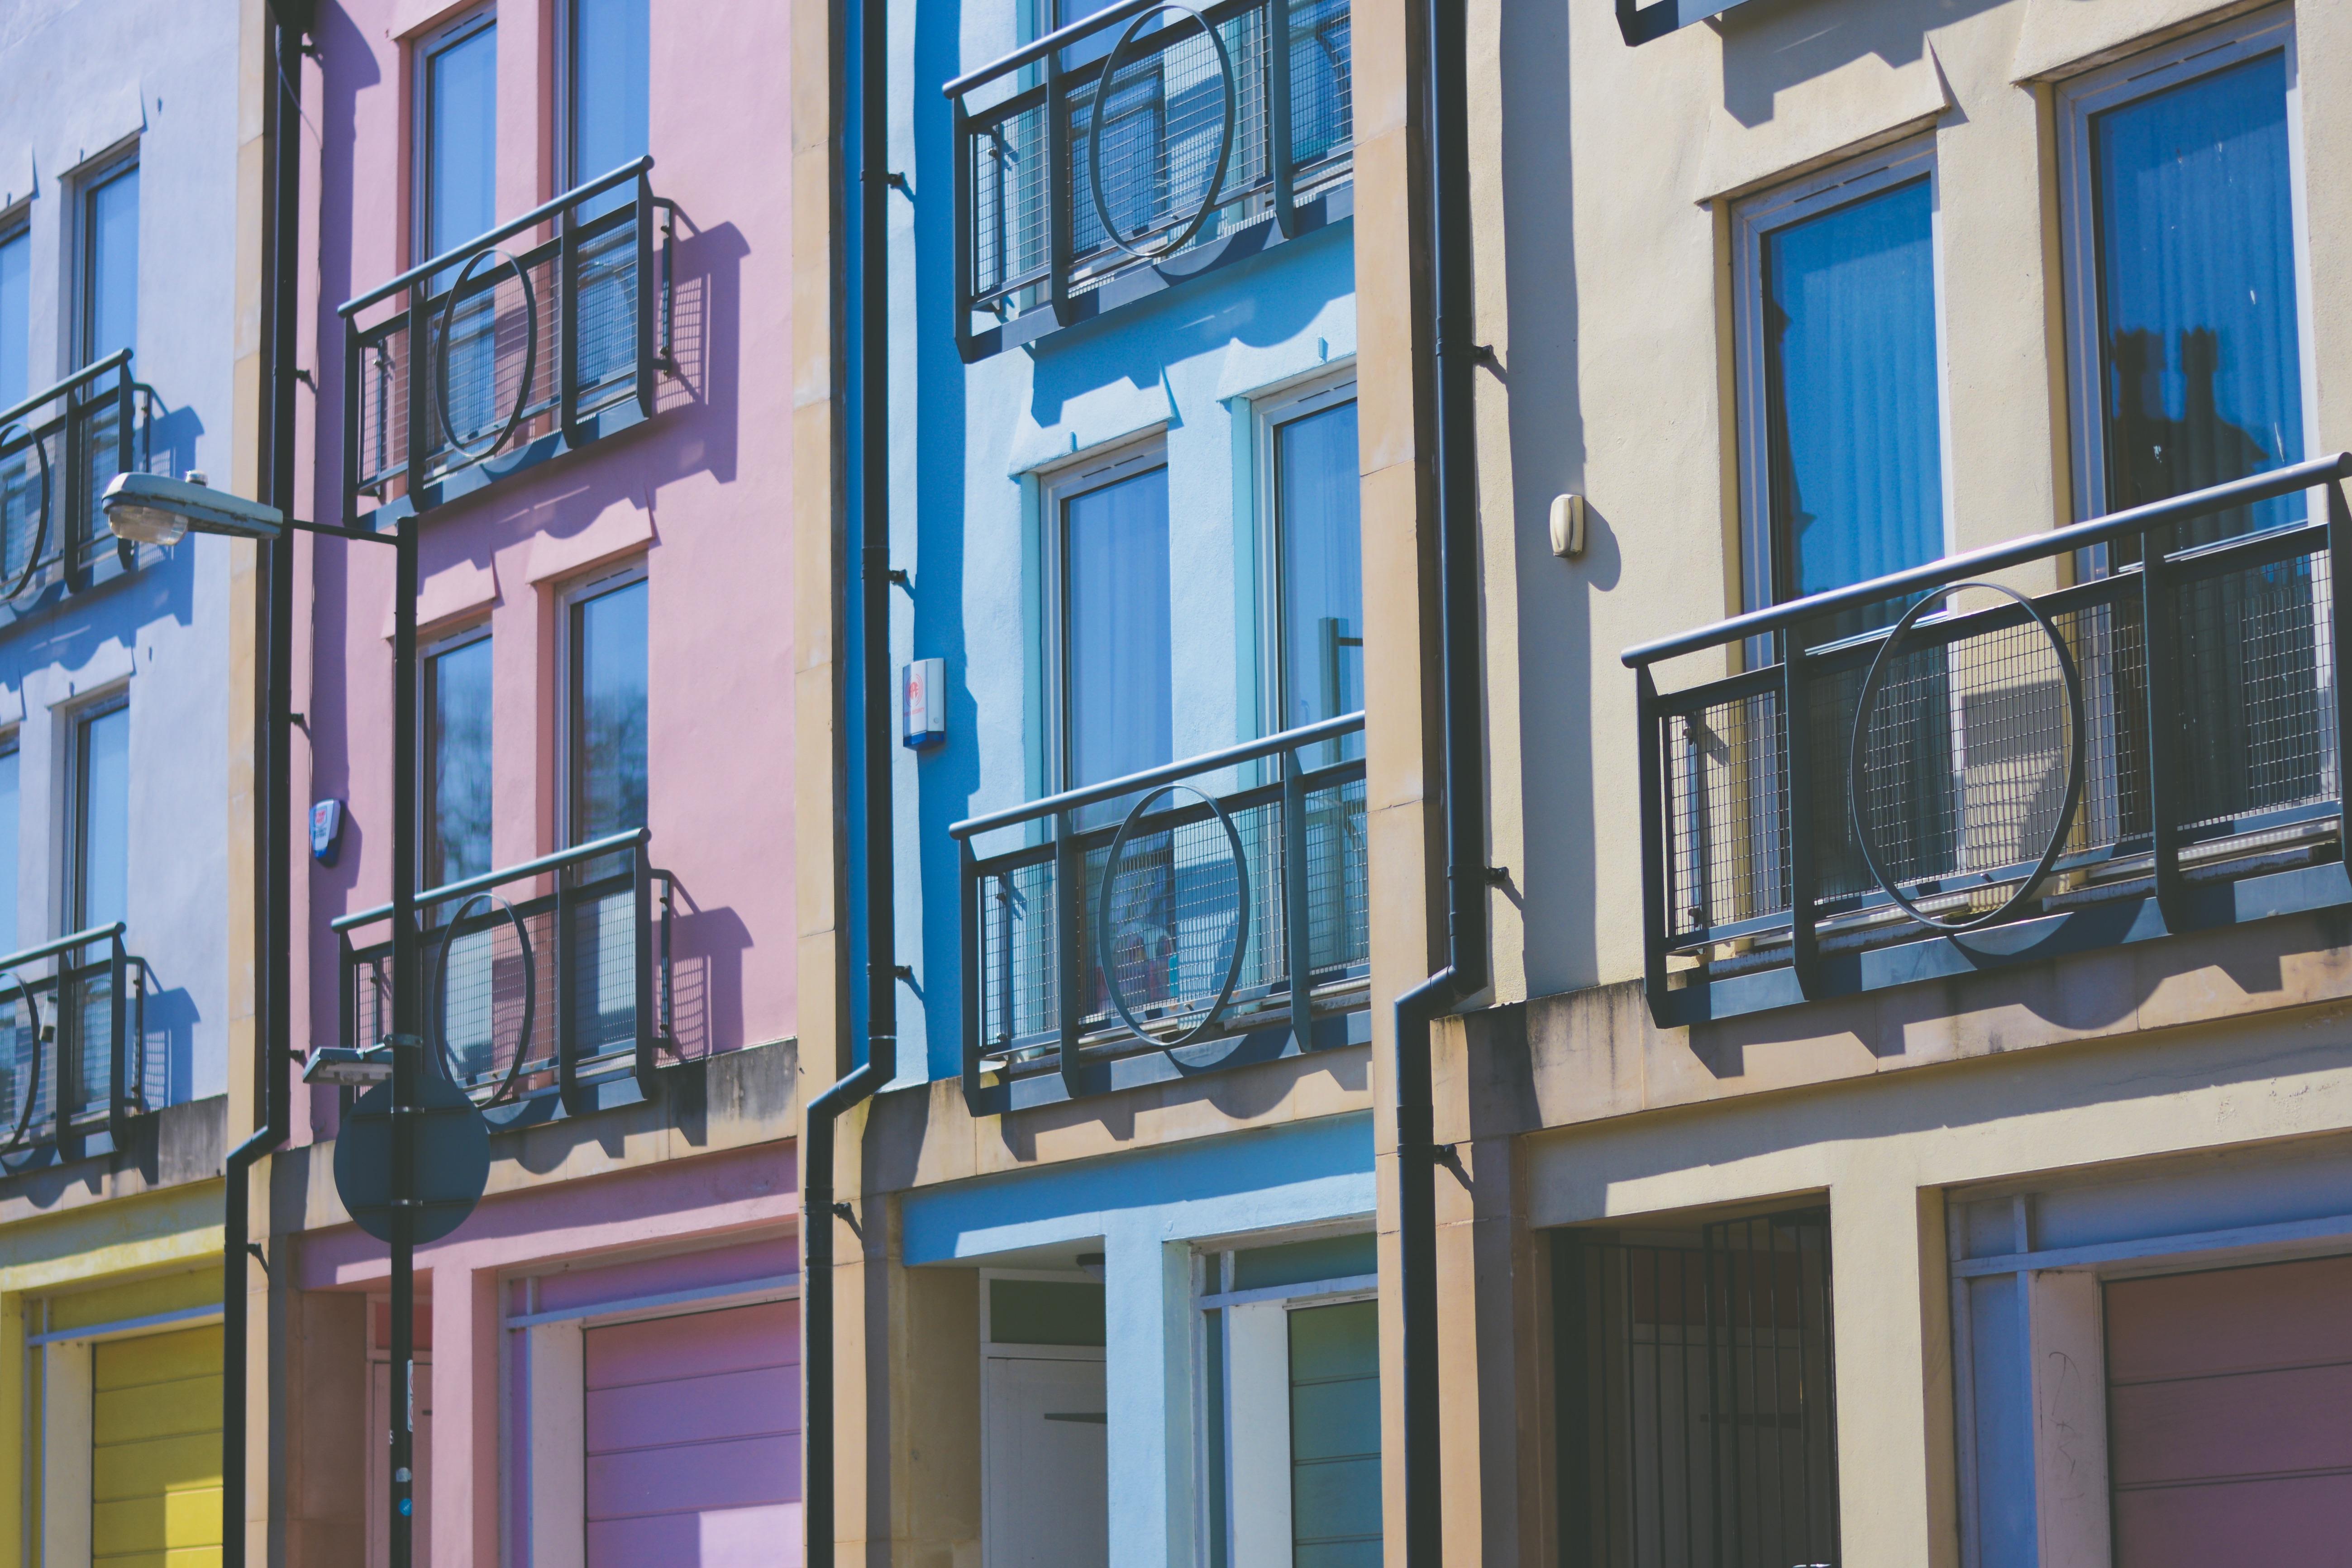 Картинки : архитектура, окно, балкон, фасад, имущество, сини.